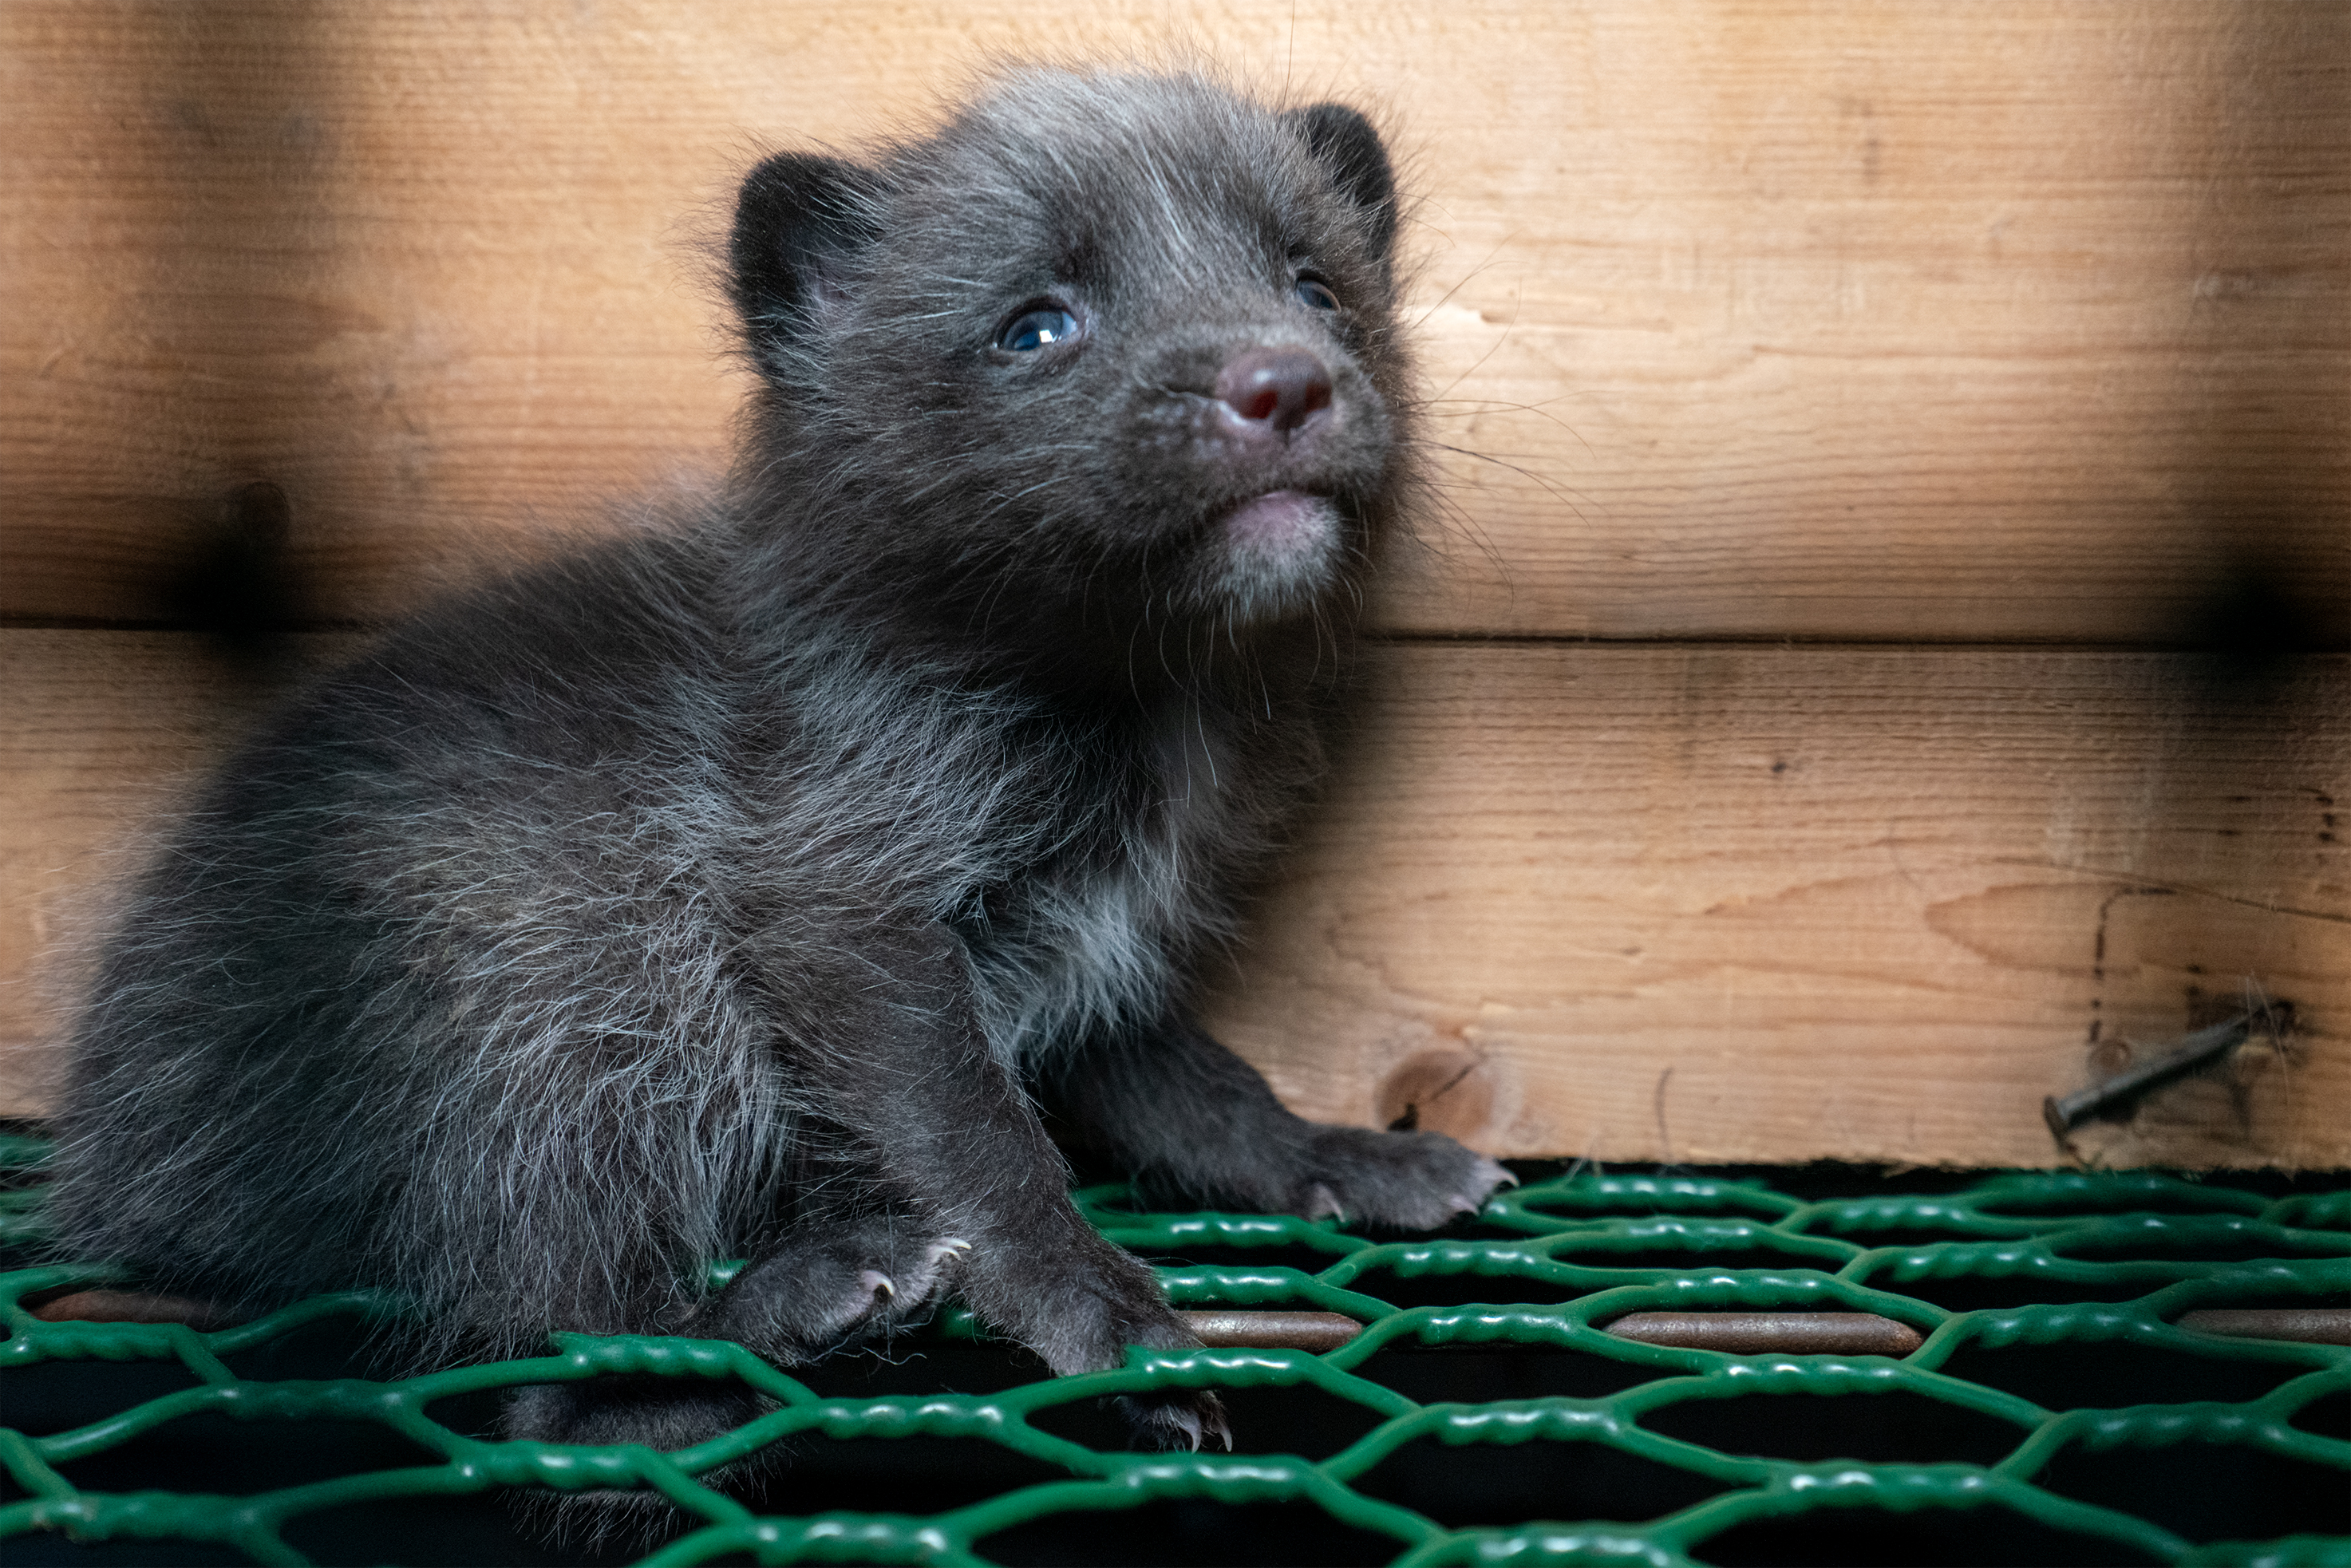 Fox in cage on a fur farm in Finland